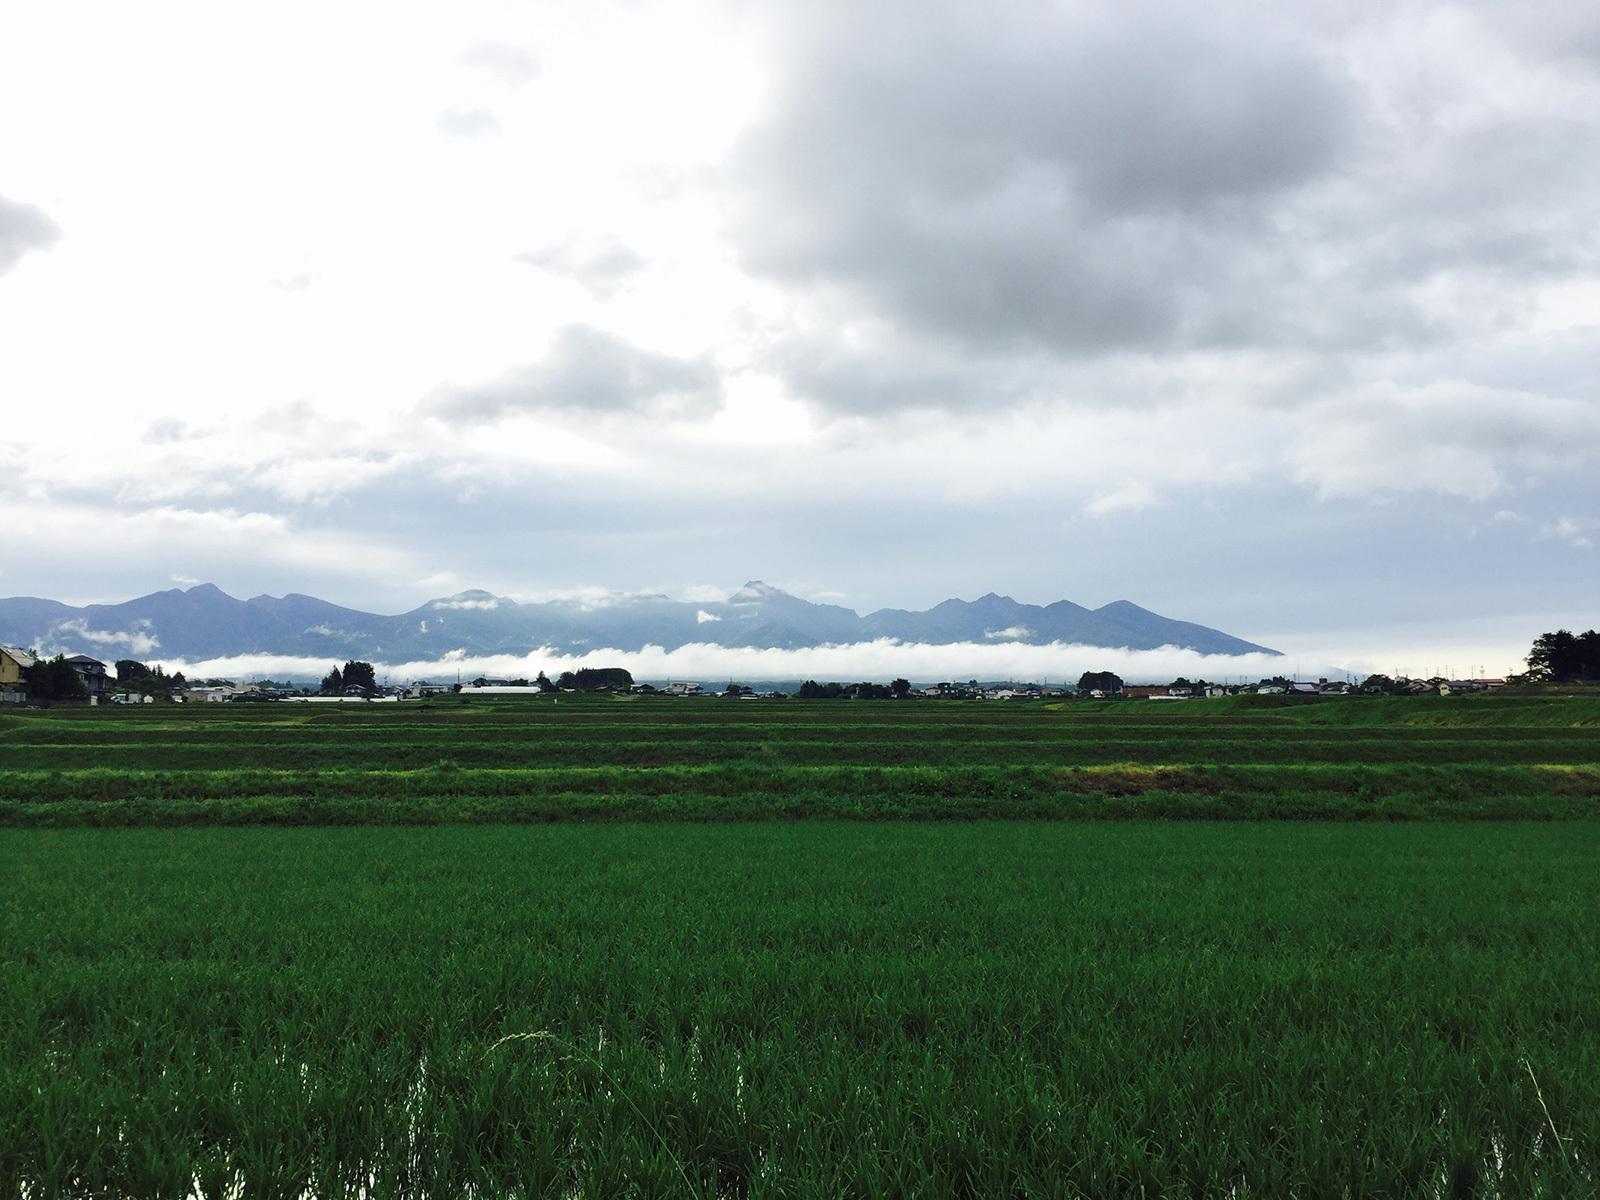 20170622_yatsugatake_1s.jpg